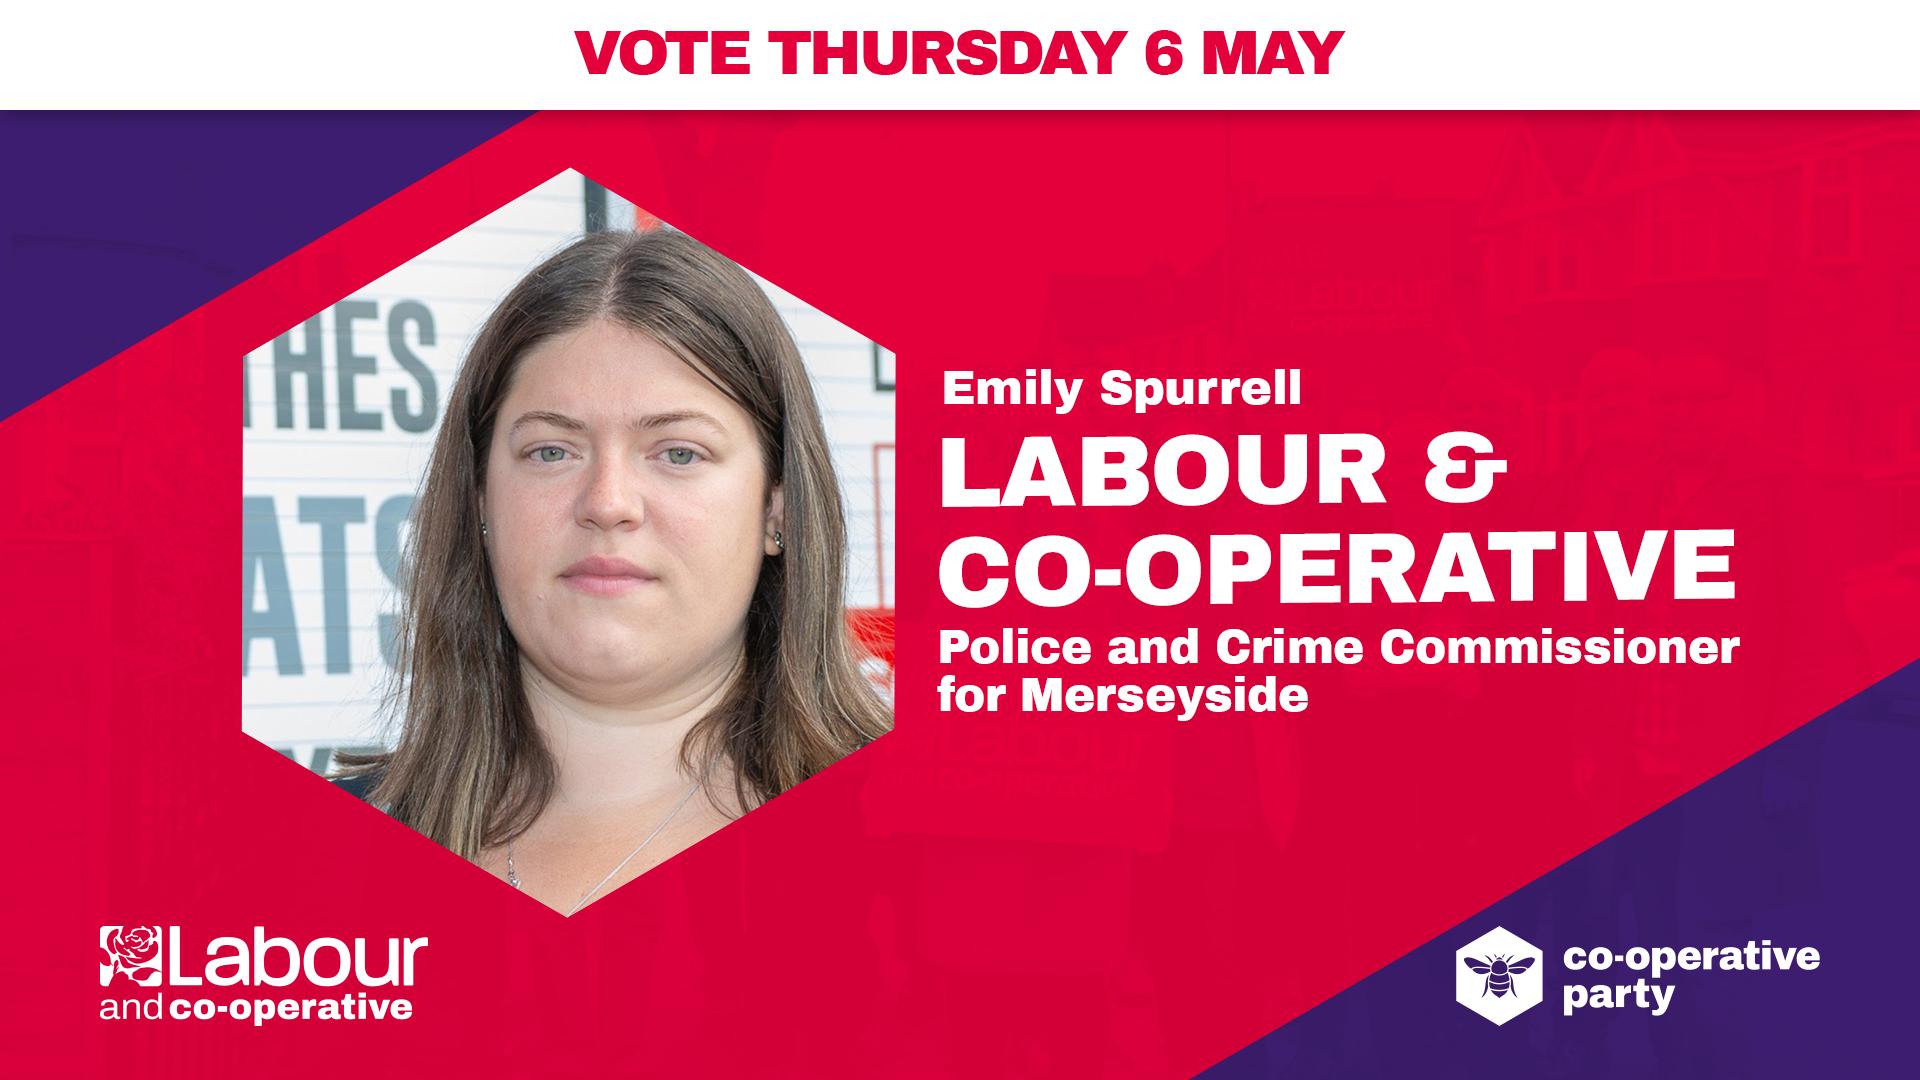 Emily Spurrell